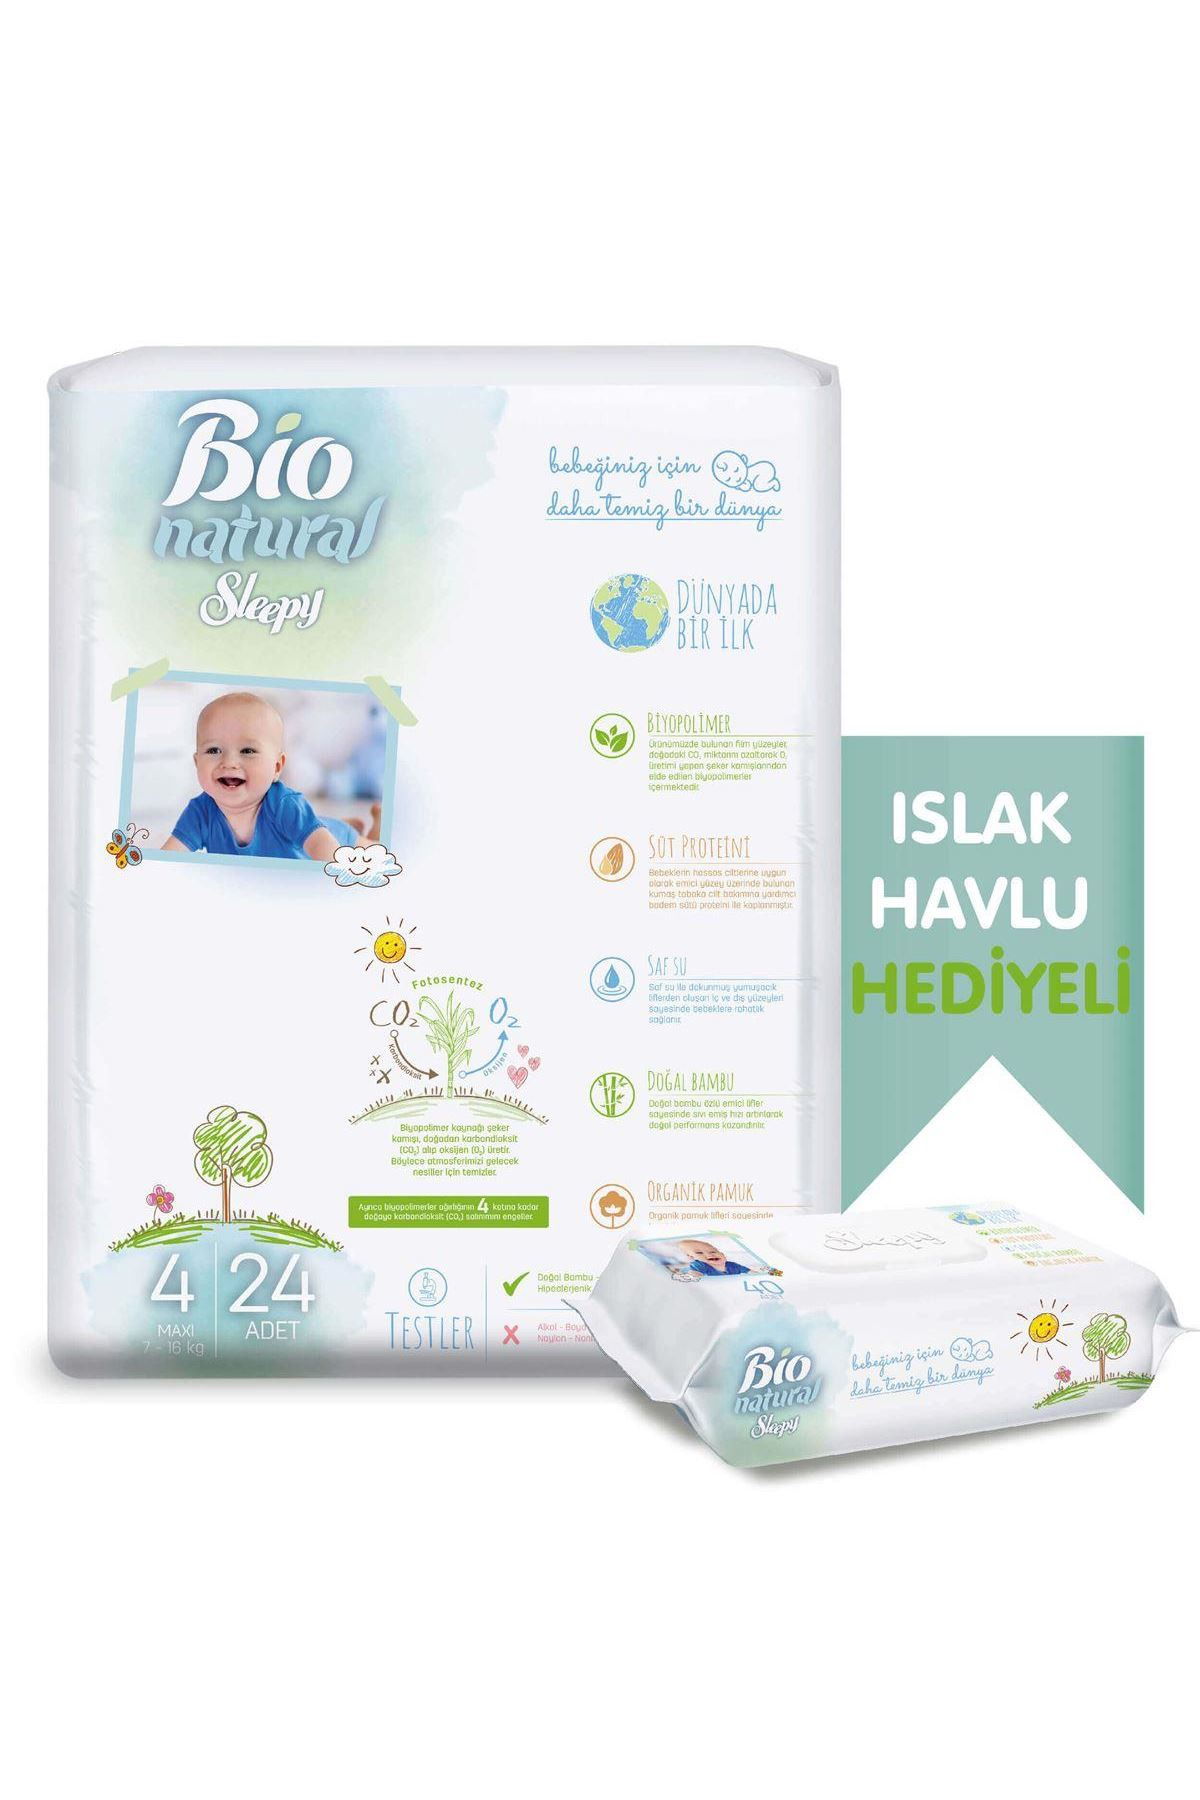 Sleepy Bio Naturel Bebek Bezi Jumbo 4 Beden 7-18 Kg 24 Adet (Islak Havlu Hediyeli)